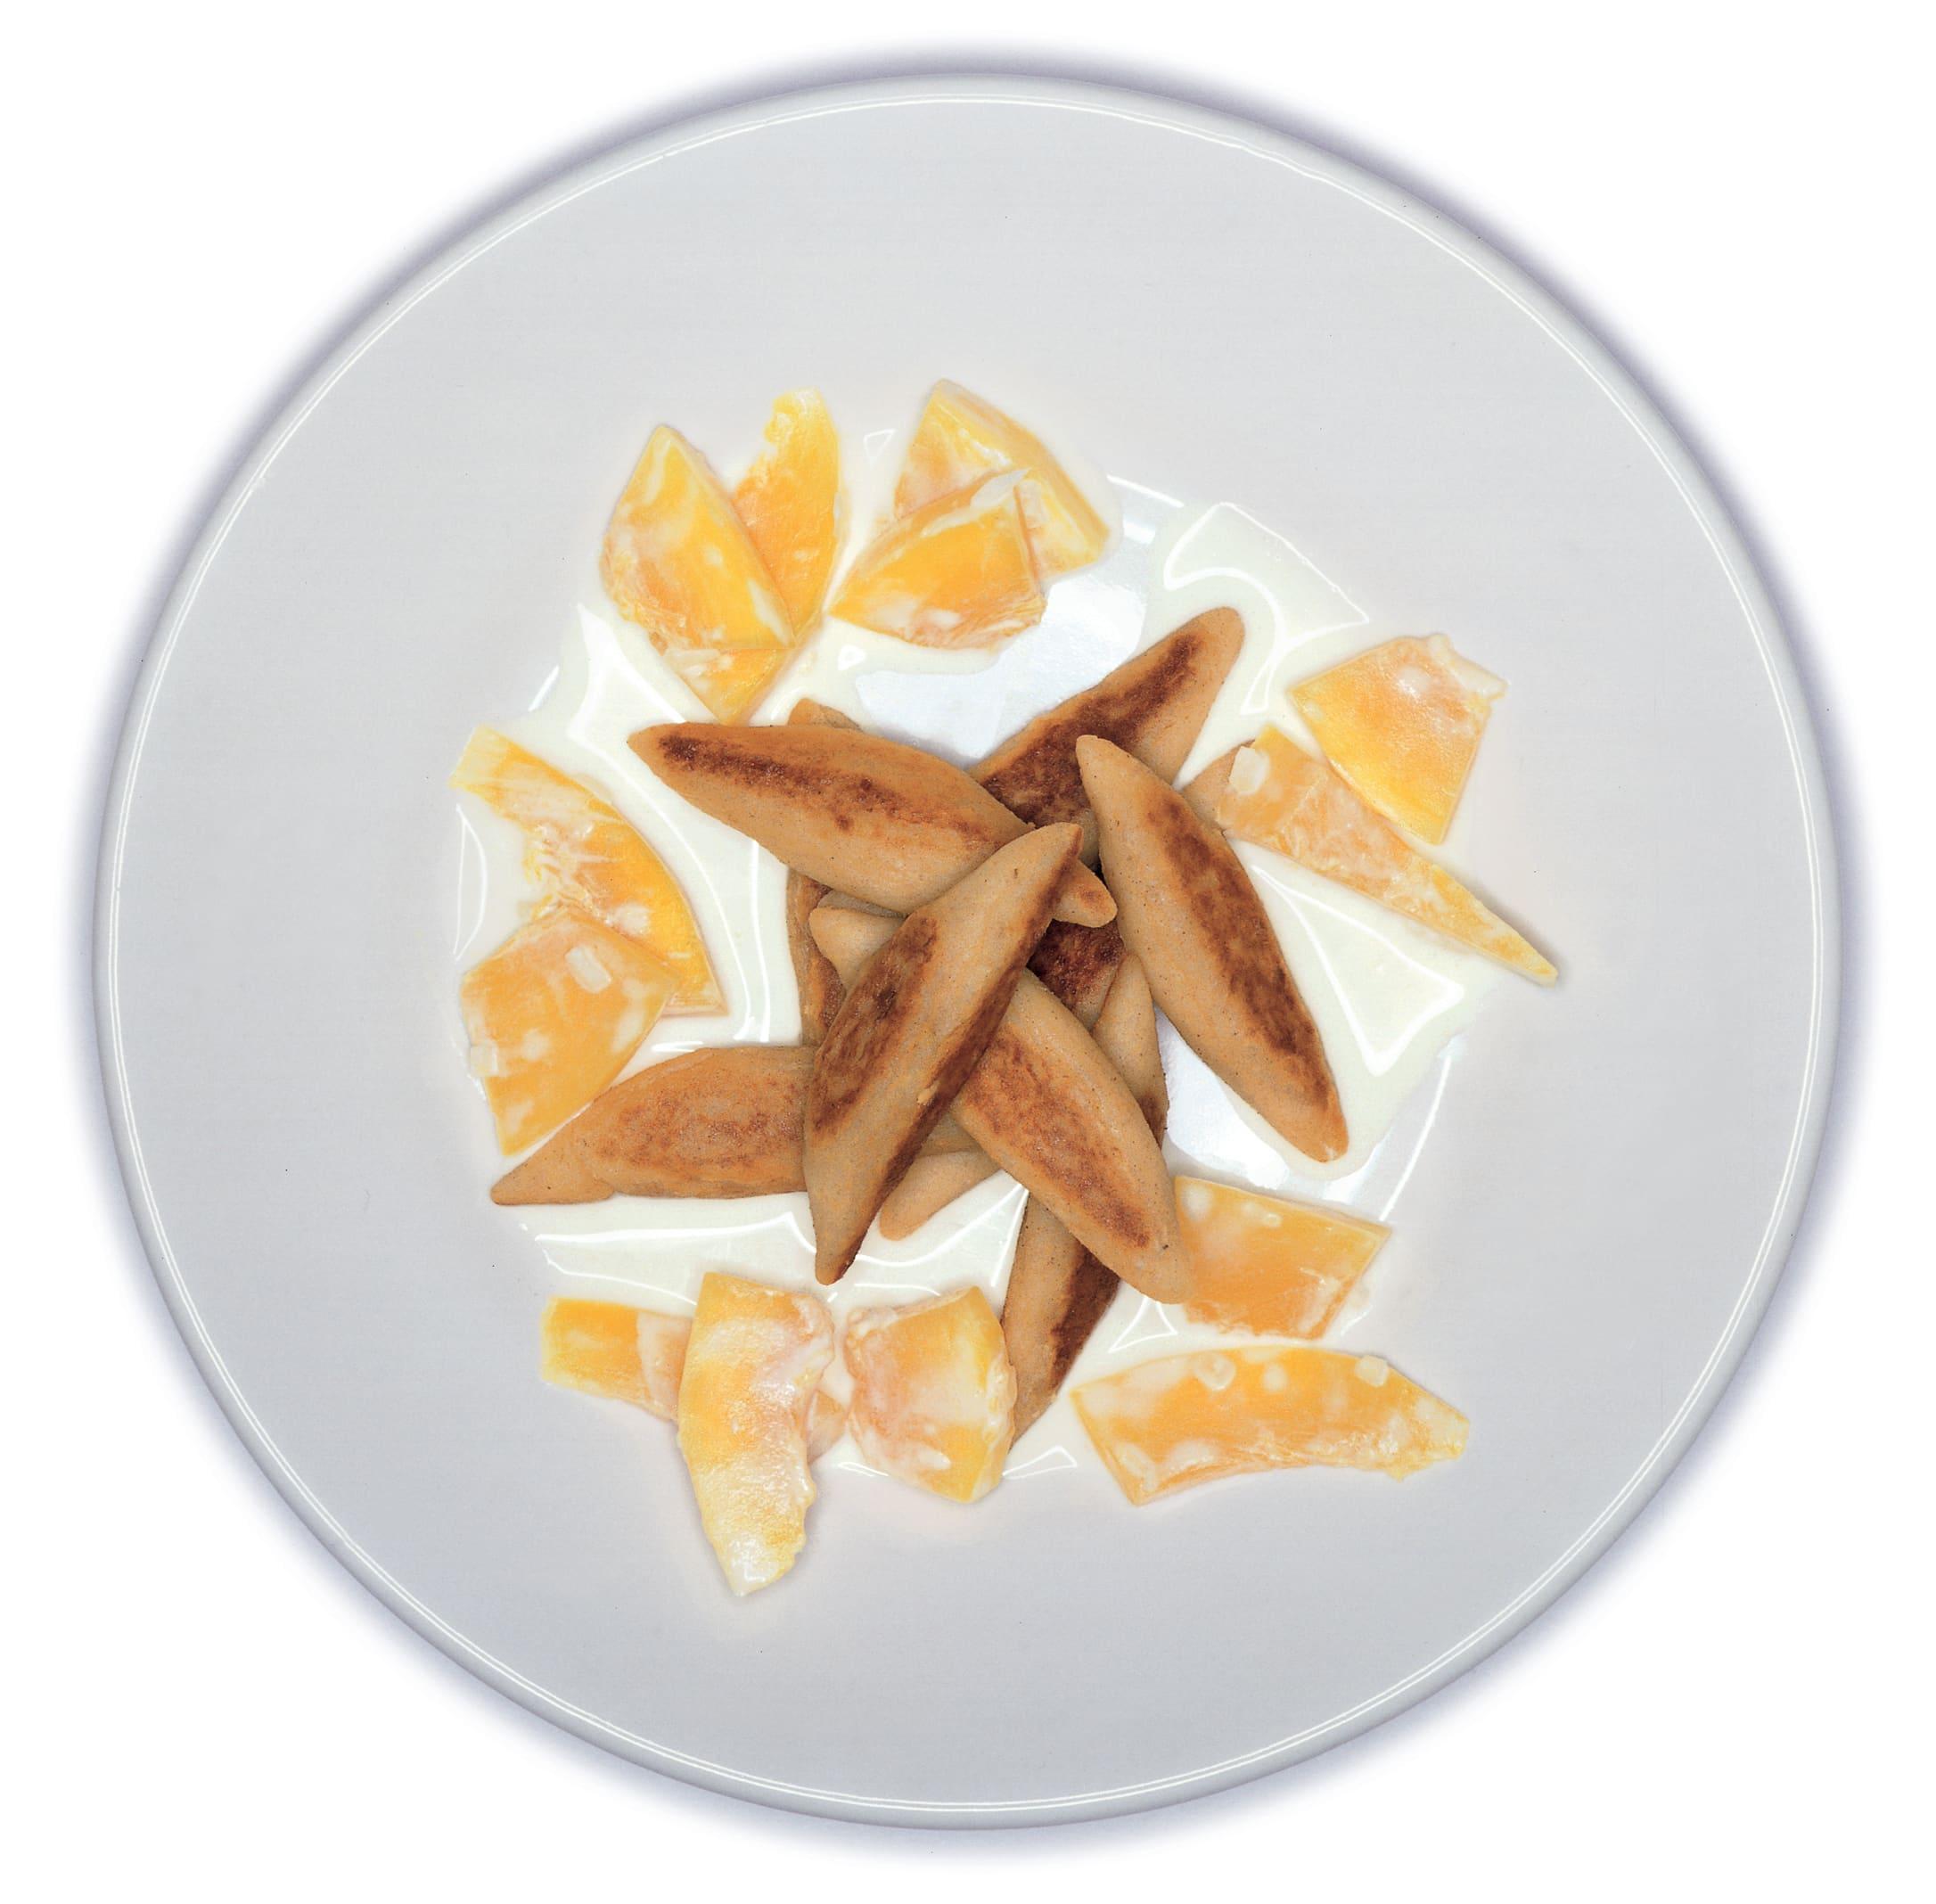 Zimt-Kartoffel-Nudeln mit Kürbisgemüse